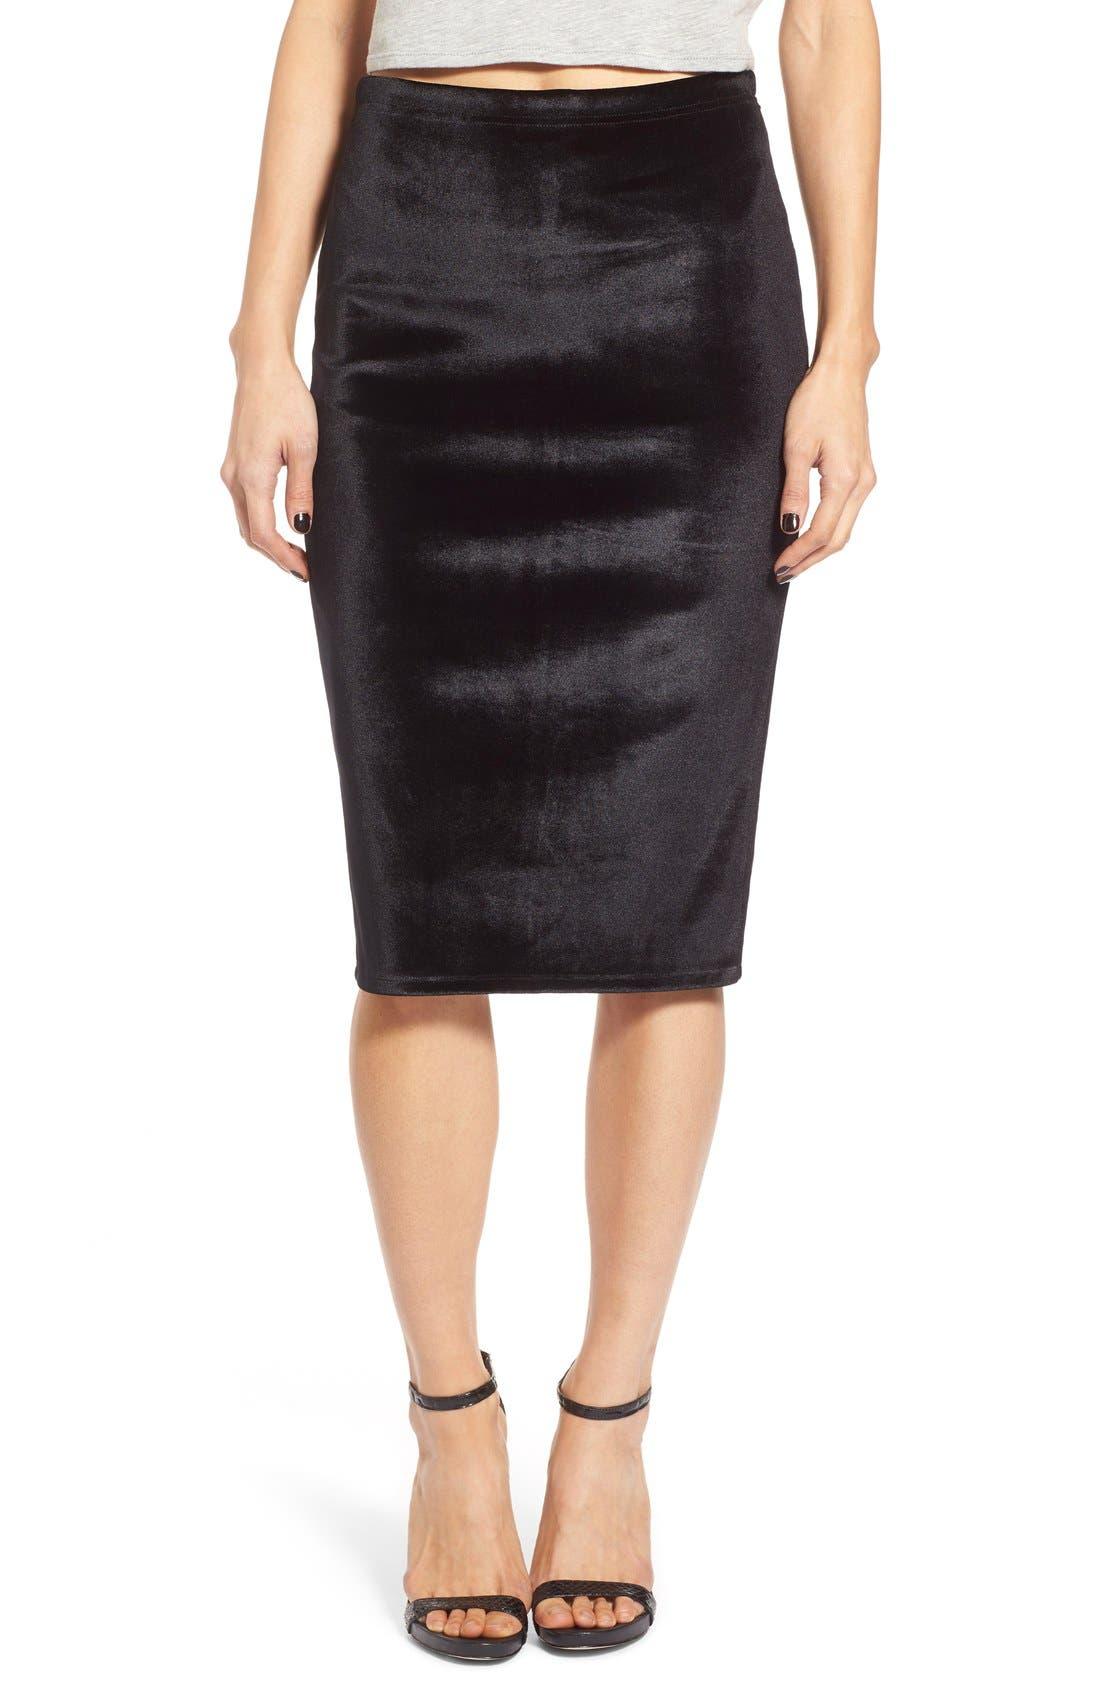 LEITH Velour Pencil Skirt, Main, color, 001